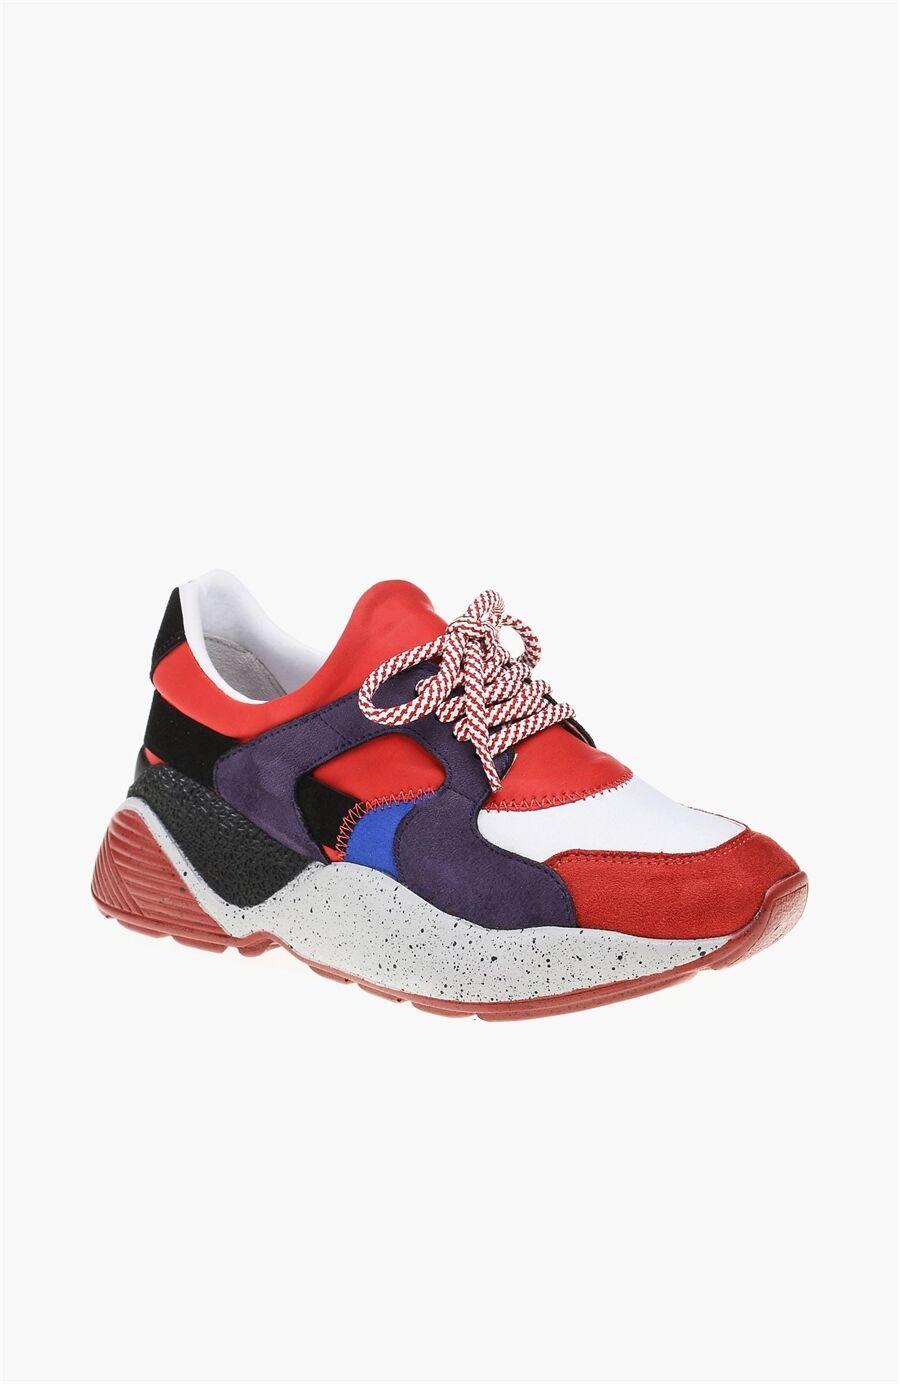 Gıro Kırmızı Sneaker – 195.0 TL